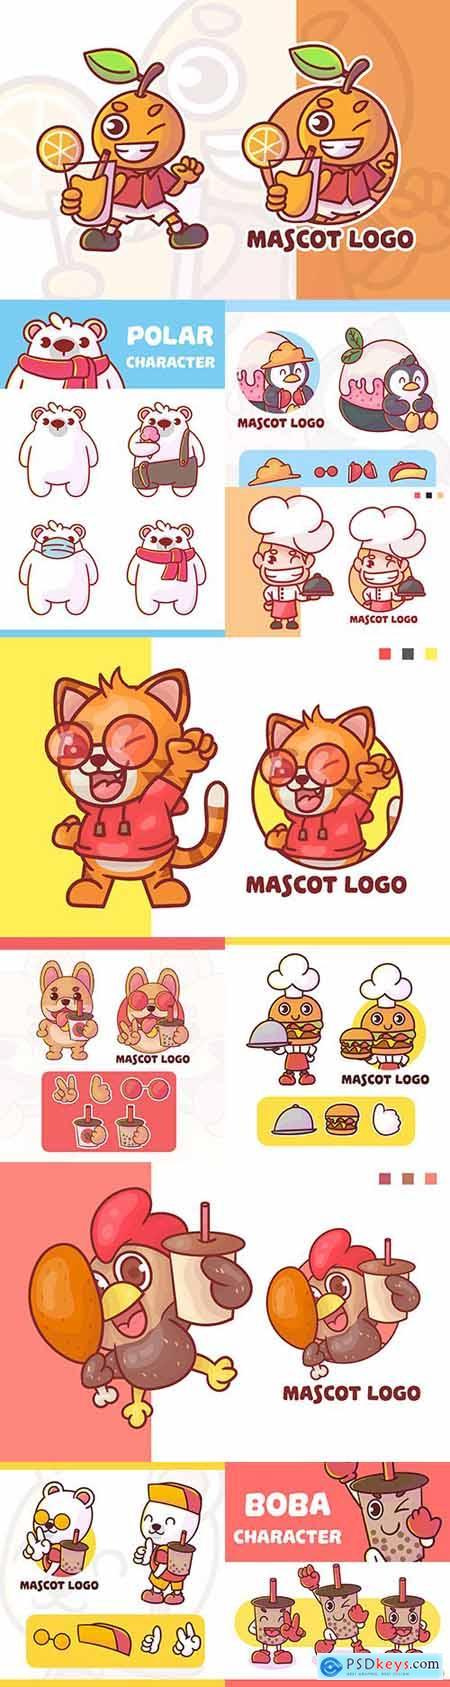 Emblem mascot and brand name logos design 23